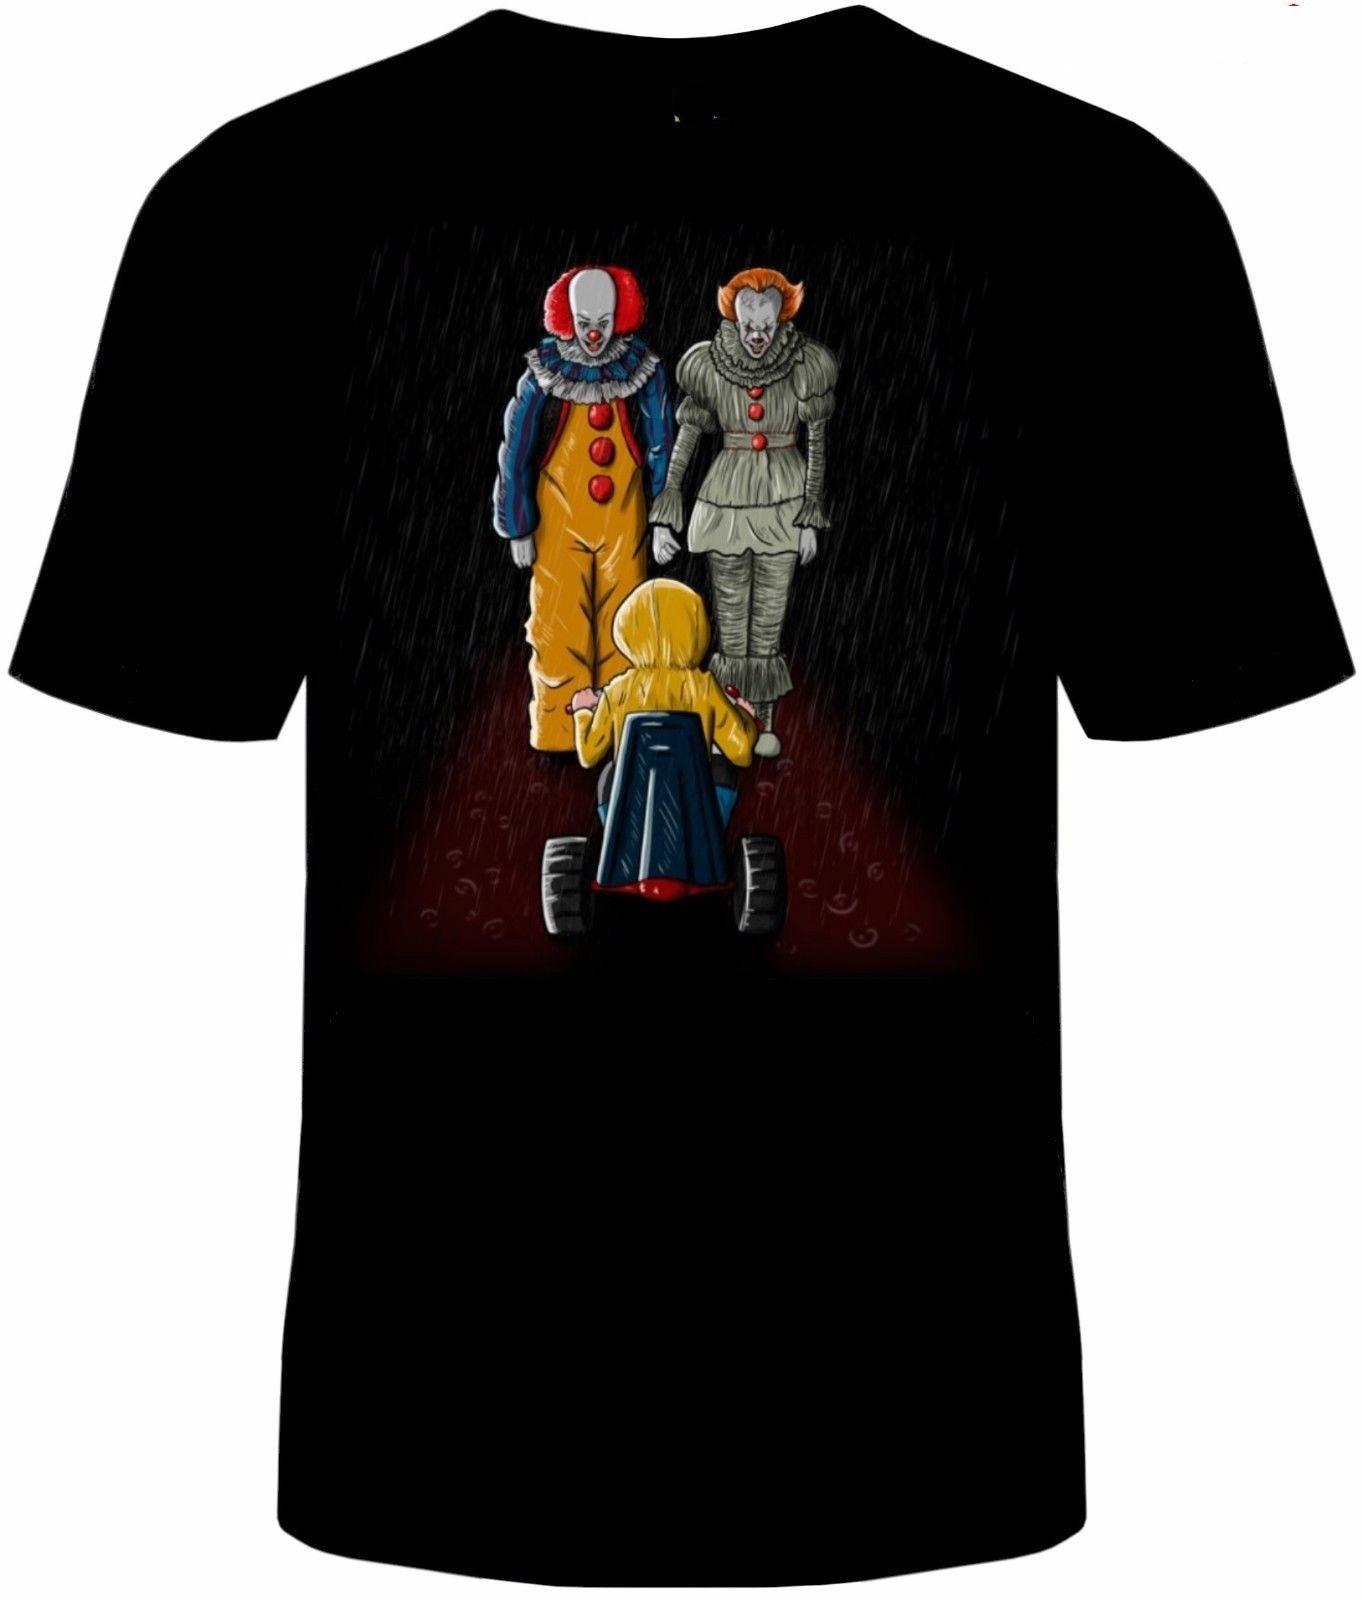 Camiseta para hombre Pennywise IT Man Hiya, payaso adulto, Stephen, camiseta de rey, camiseta novedosa para mujer